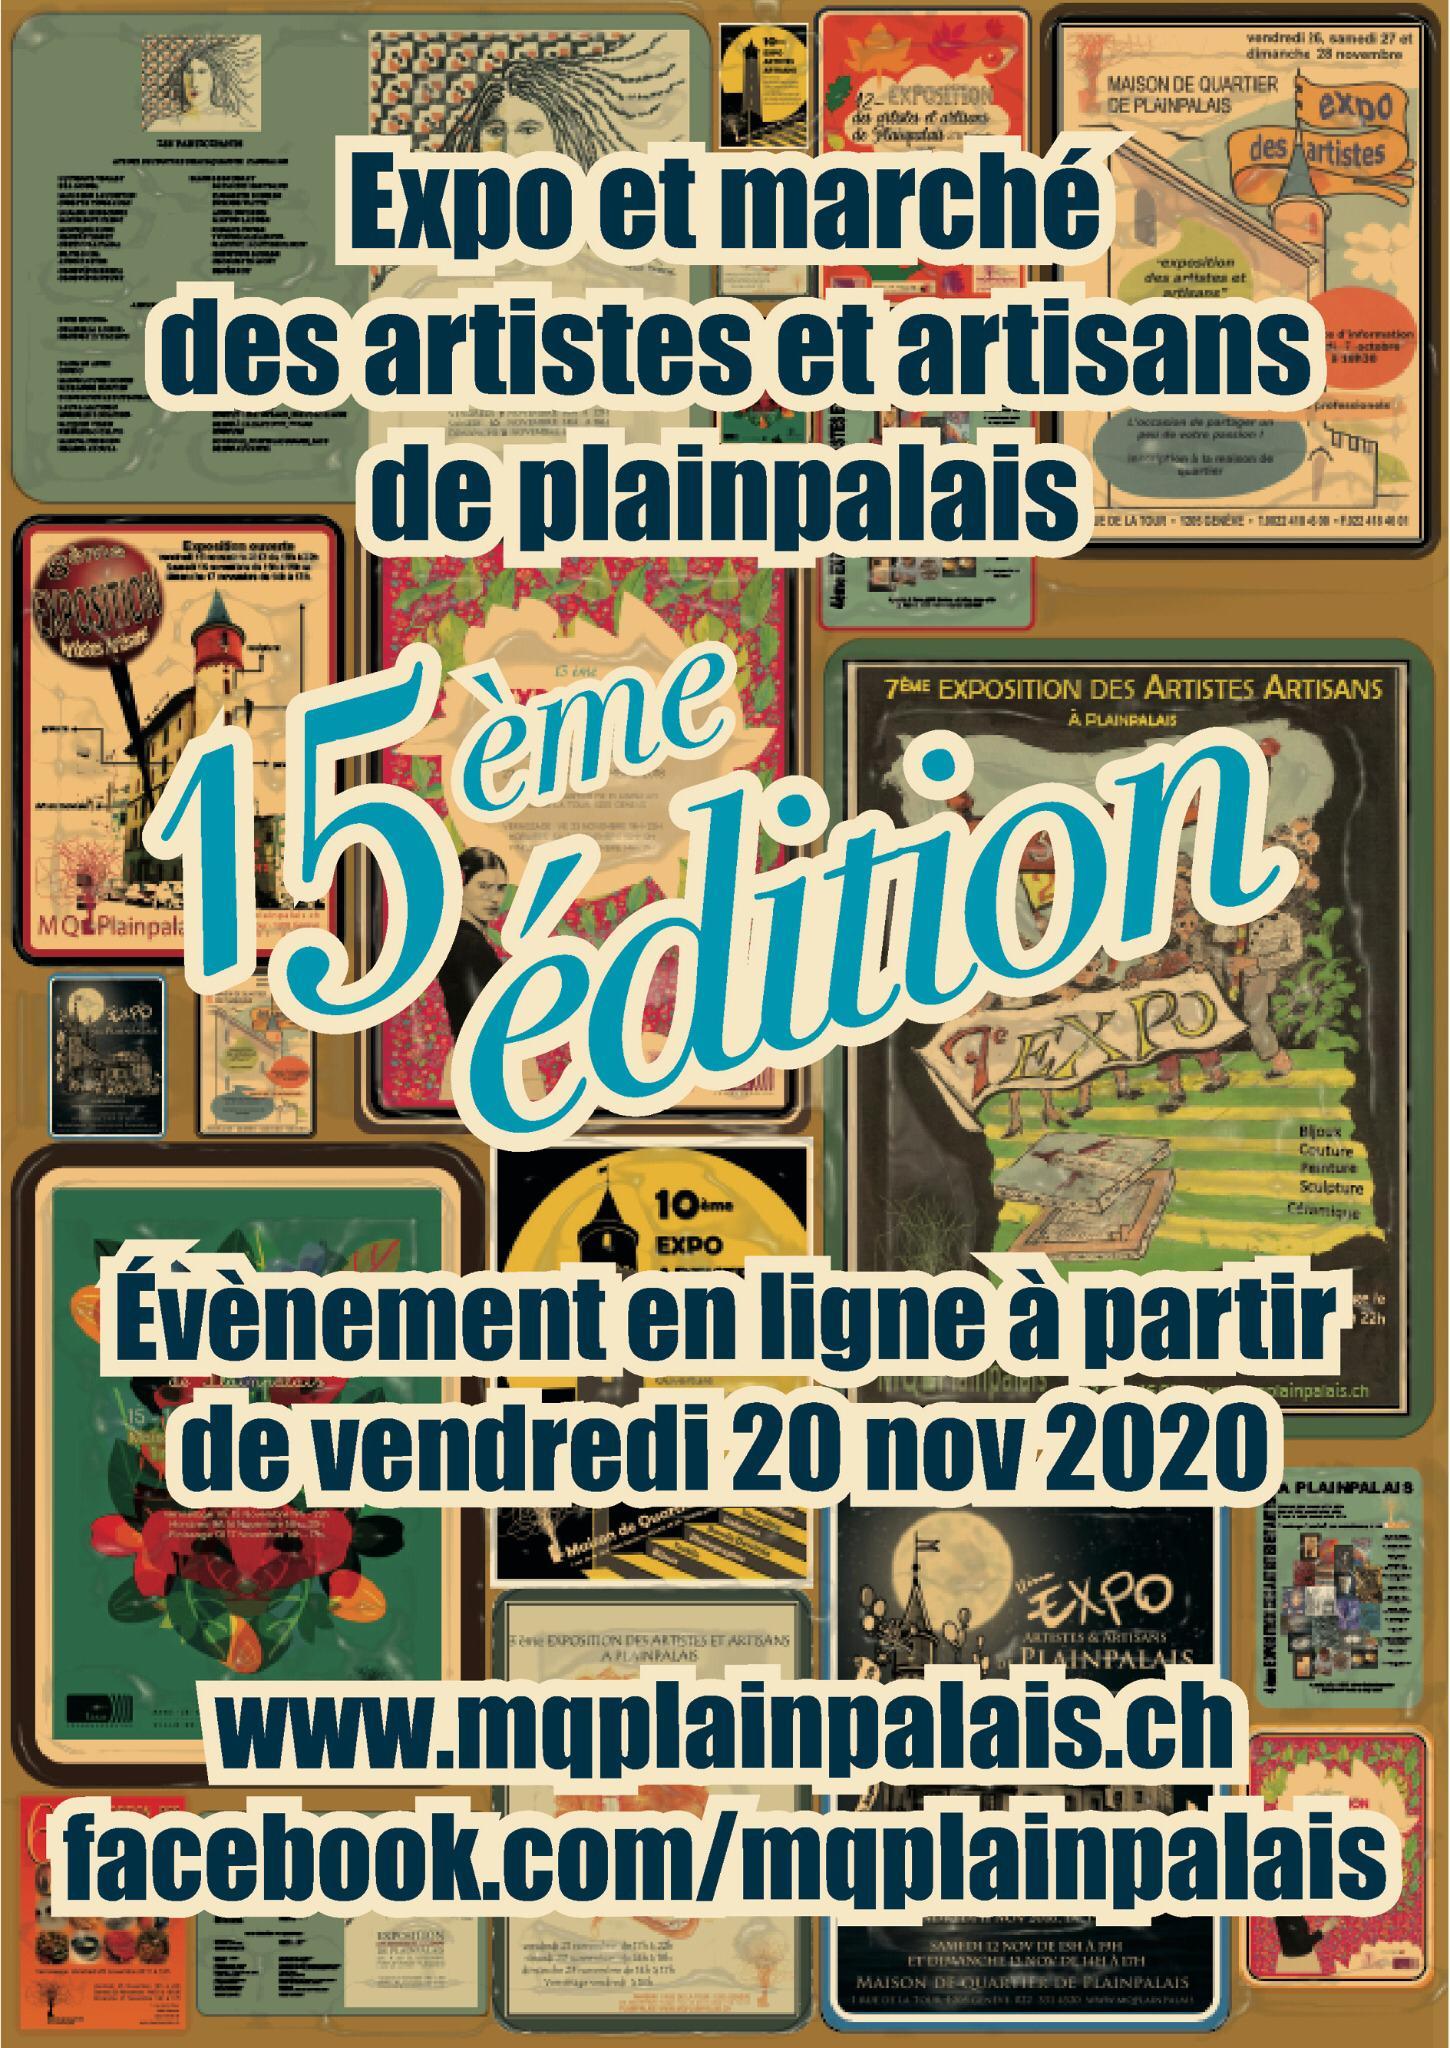 Exposition MQPlainpalais